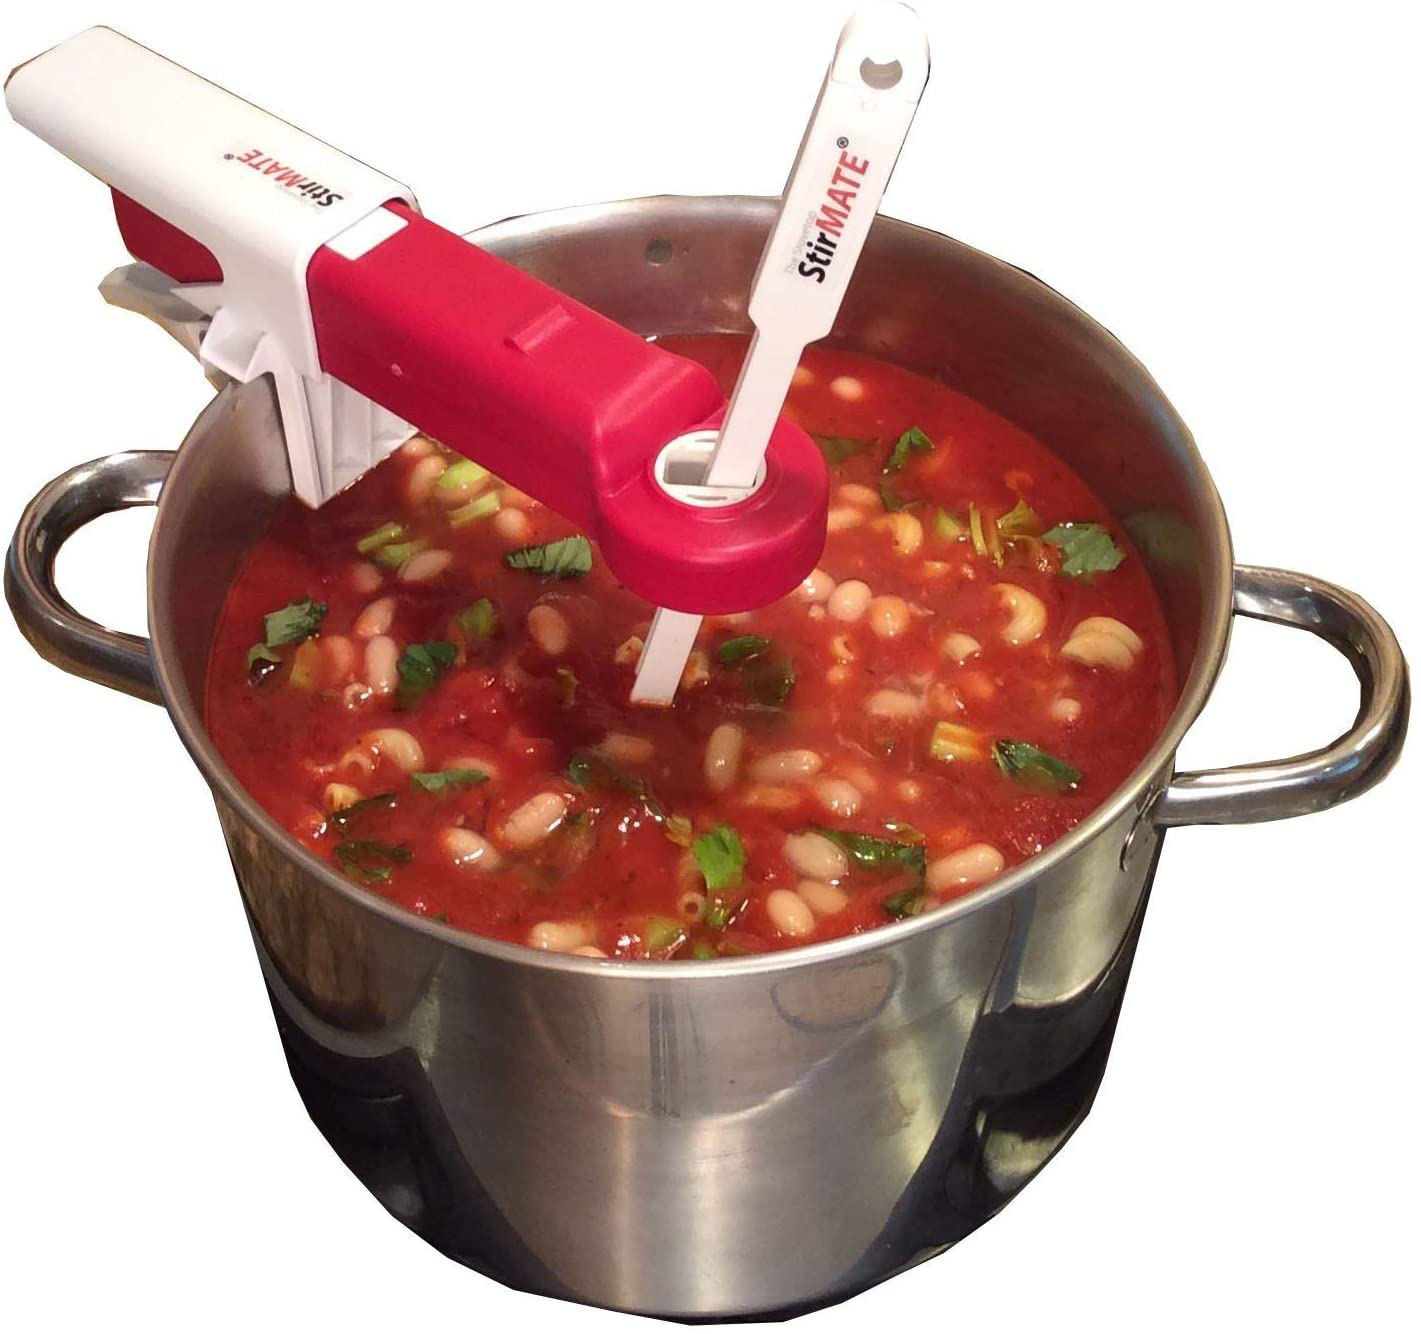 StirMATE Smart Pot Stirrer - Self-Adjusting, Powerful, Quiet, Cordless